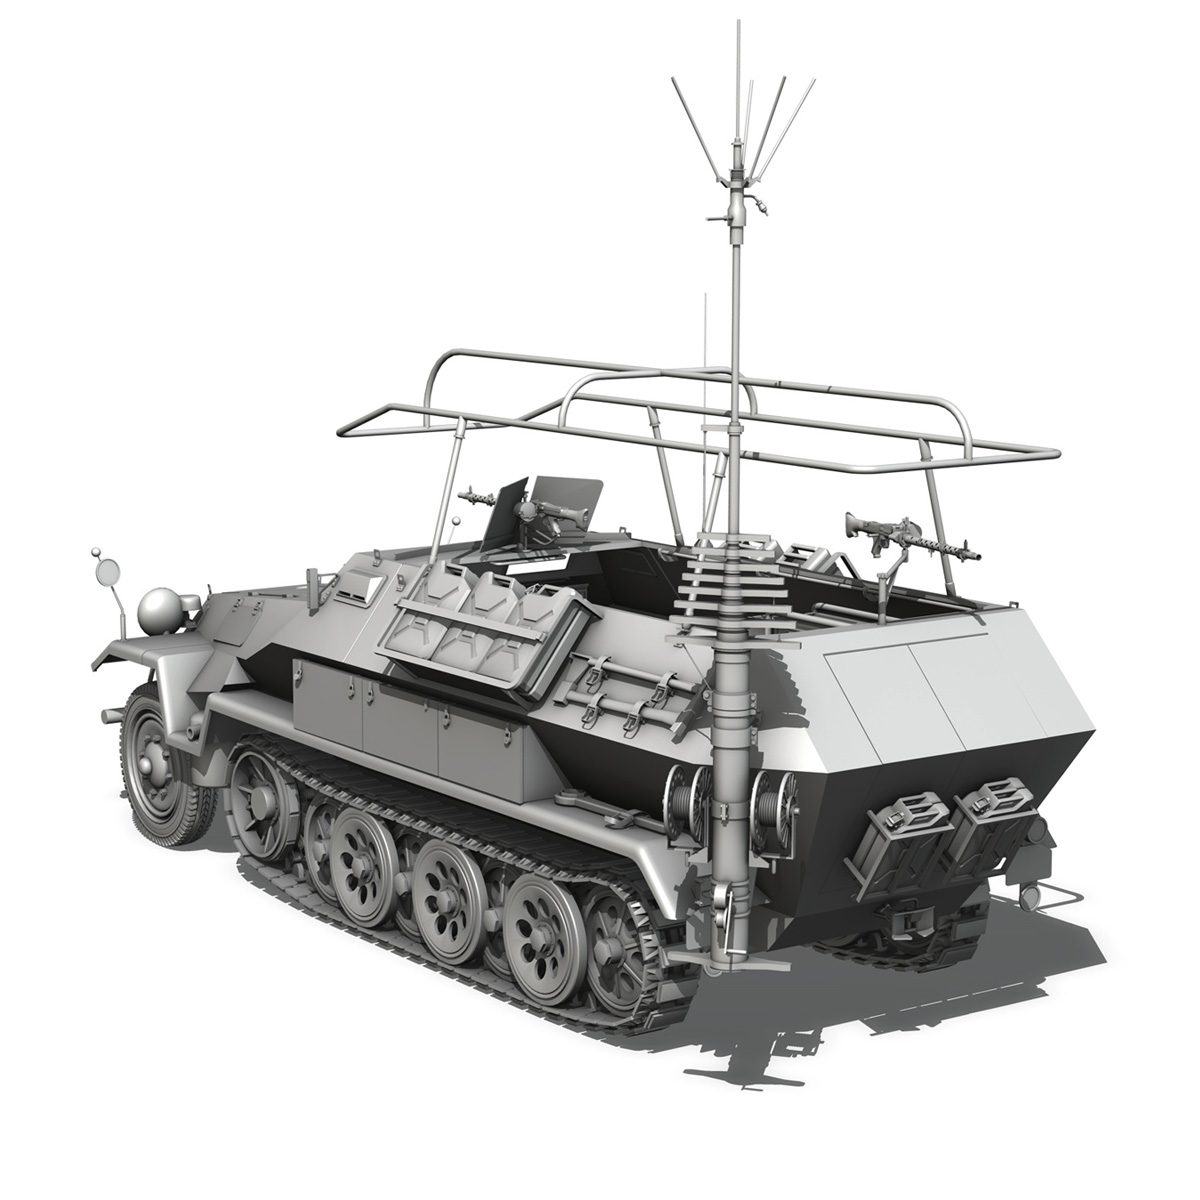 sdkfz 251 ausf.b – communications vehicle 3d model 3ds fbx c4d lwo obj 251695